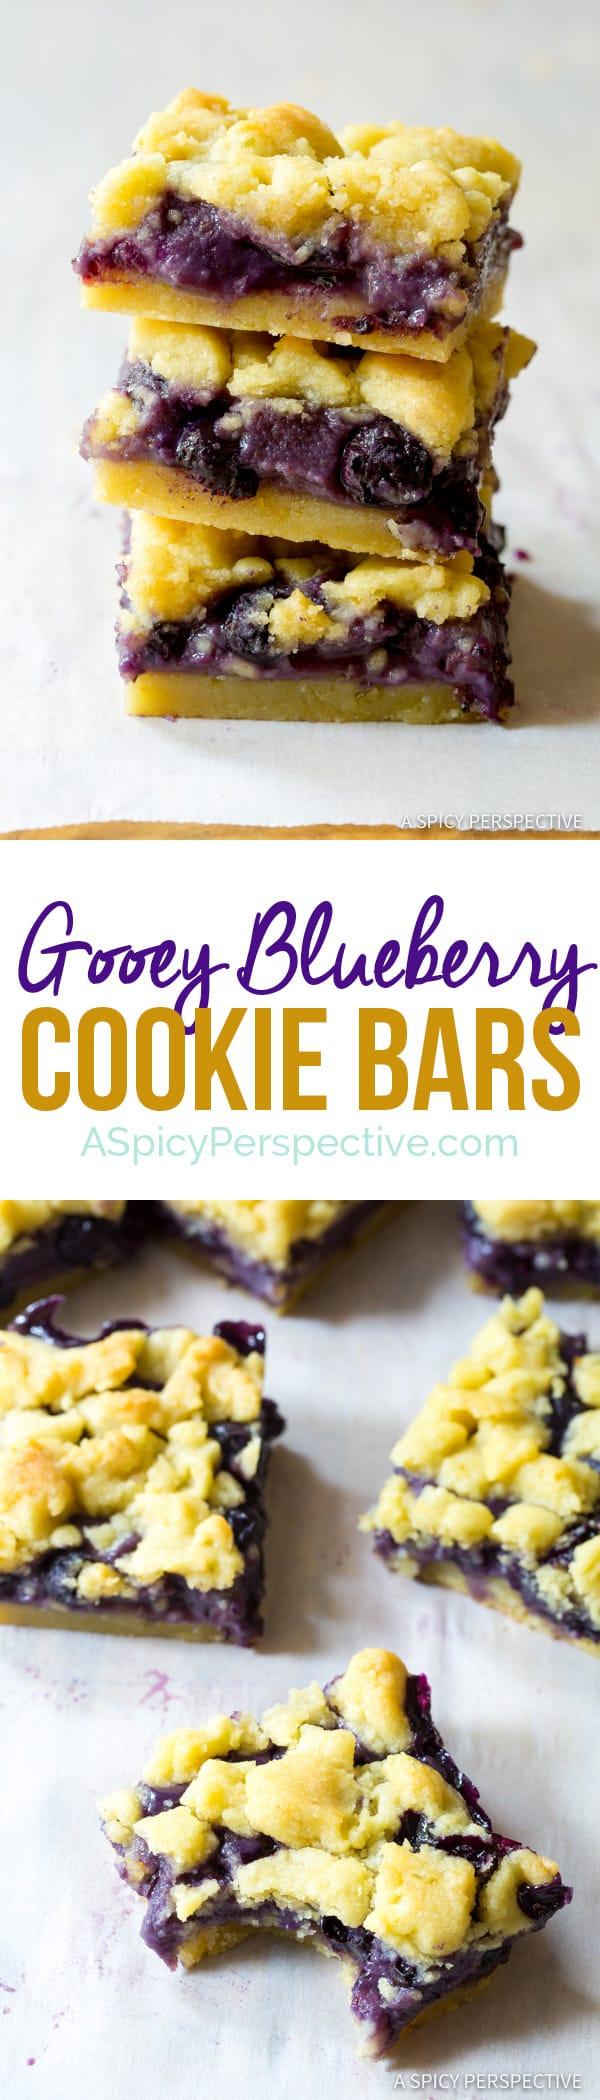 The Best Gooey Blueberry Cookie Bars   ASpicyPerspective.com